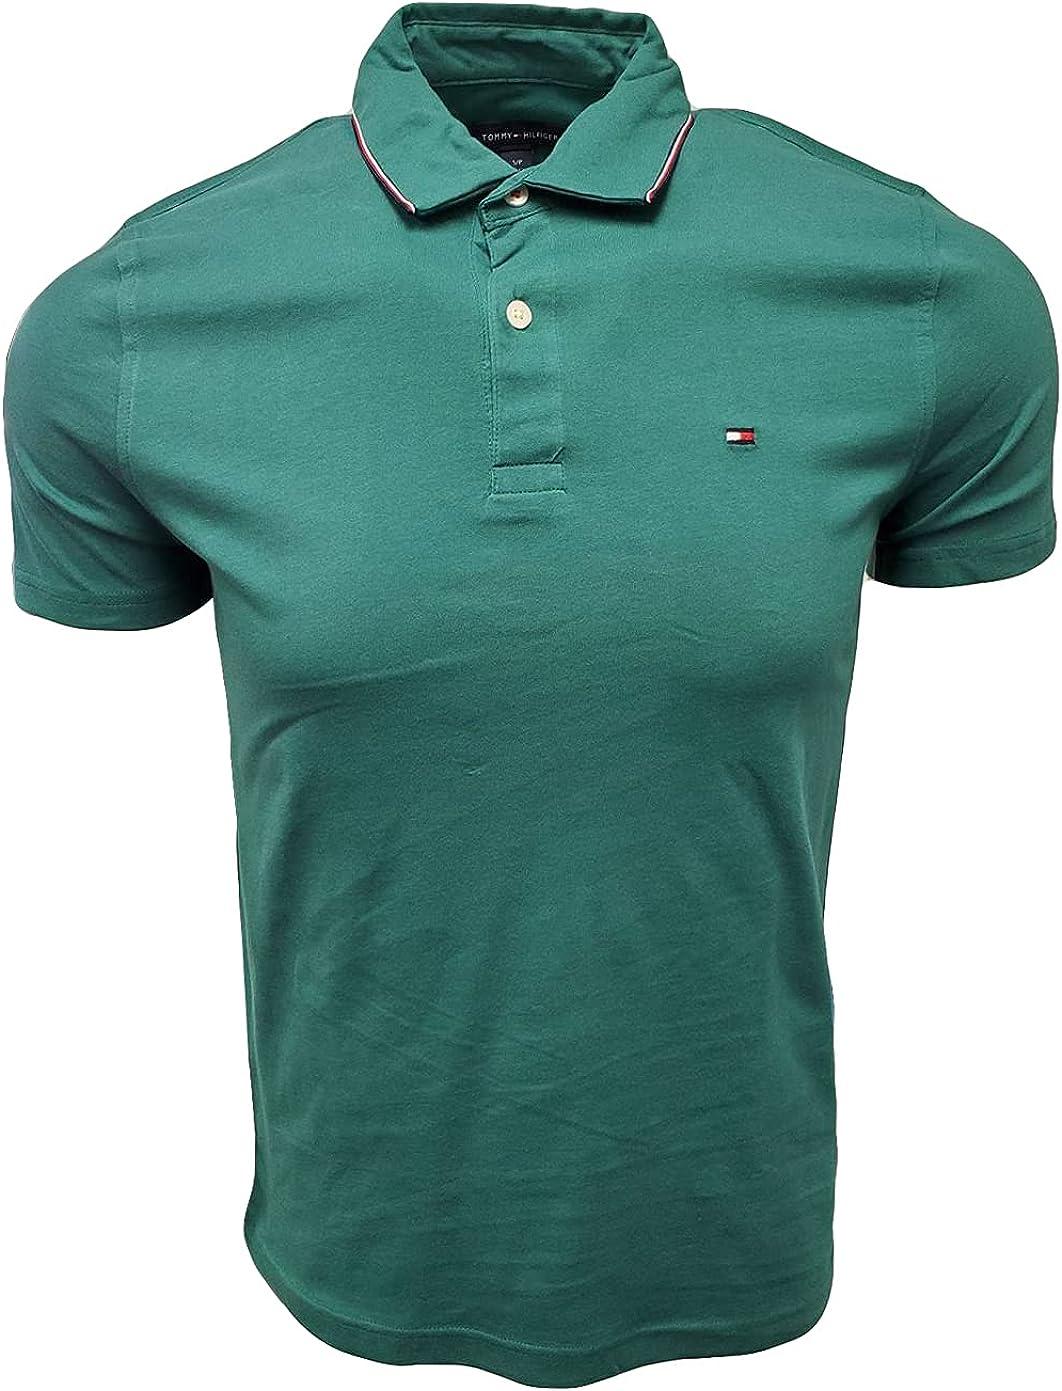 Tommy Hilfiger Men's Soft Cotton Polo